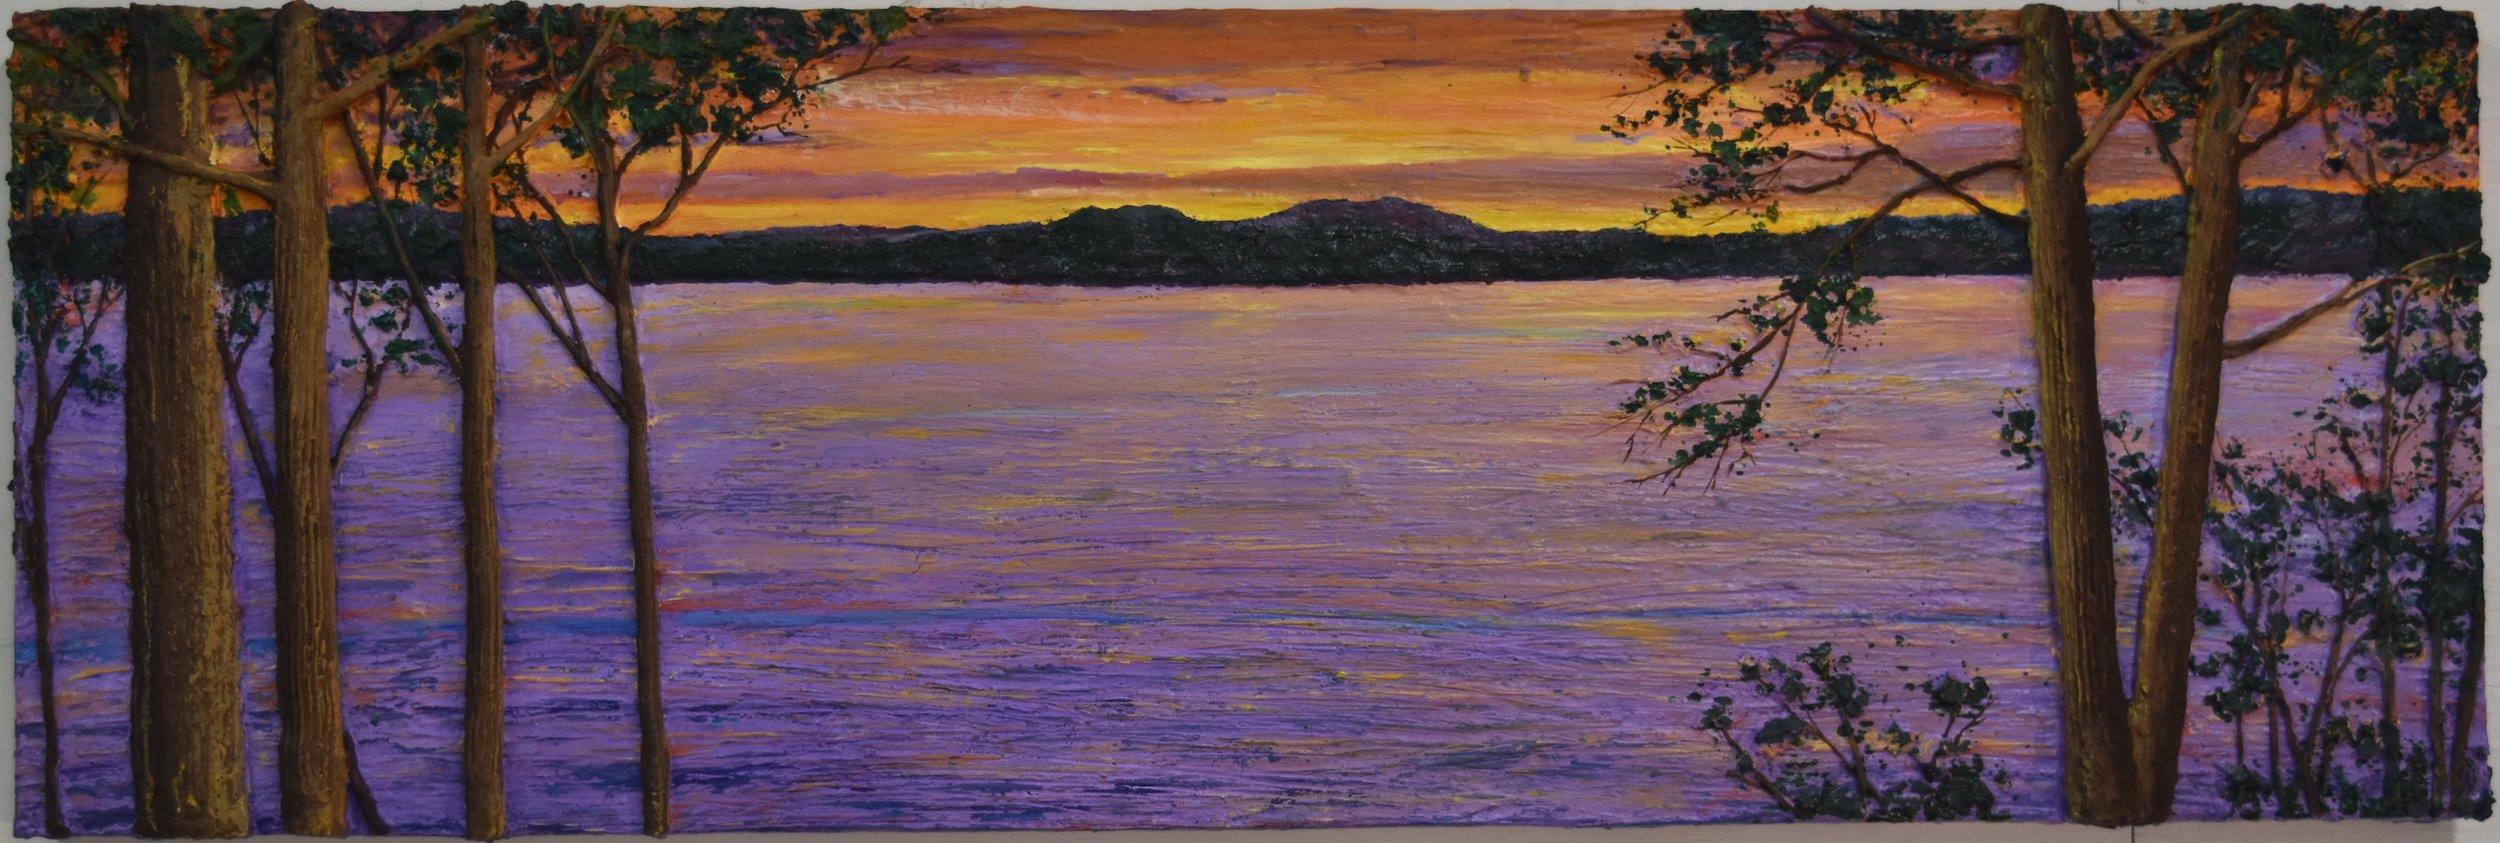 Wonderful Sunset at the Lake